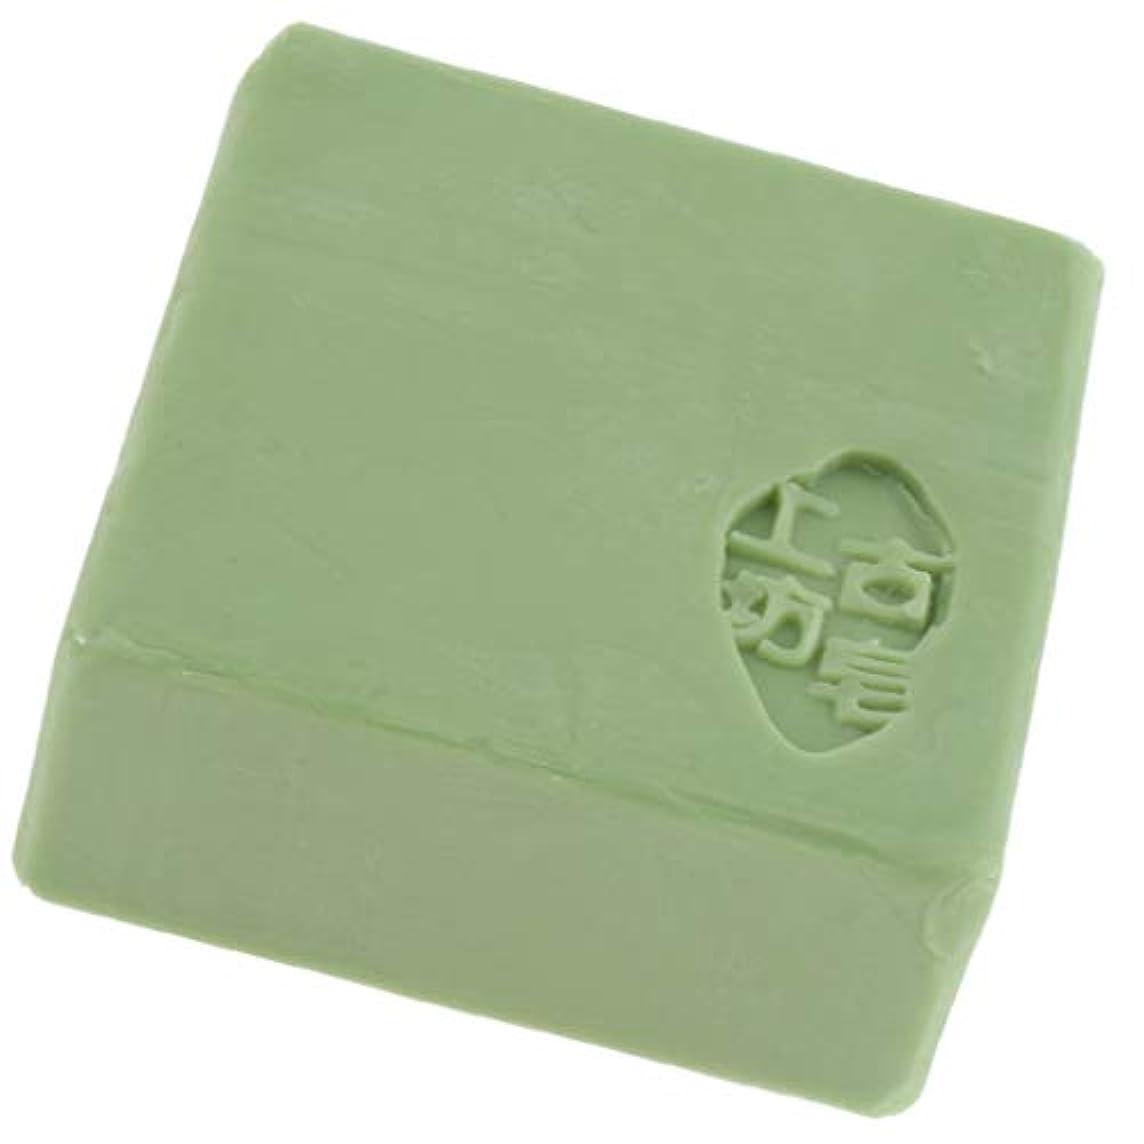 Baoblaze バス スキンケア フェイス ボディソープ 石鹸 保湿 好意 全3色 - 緑